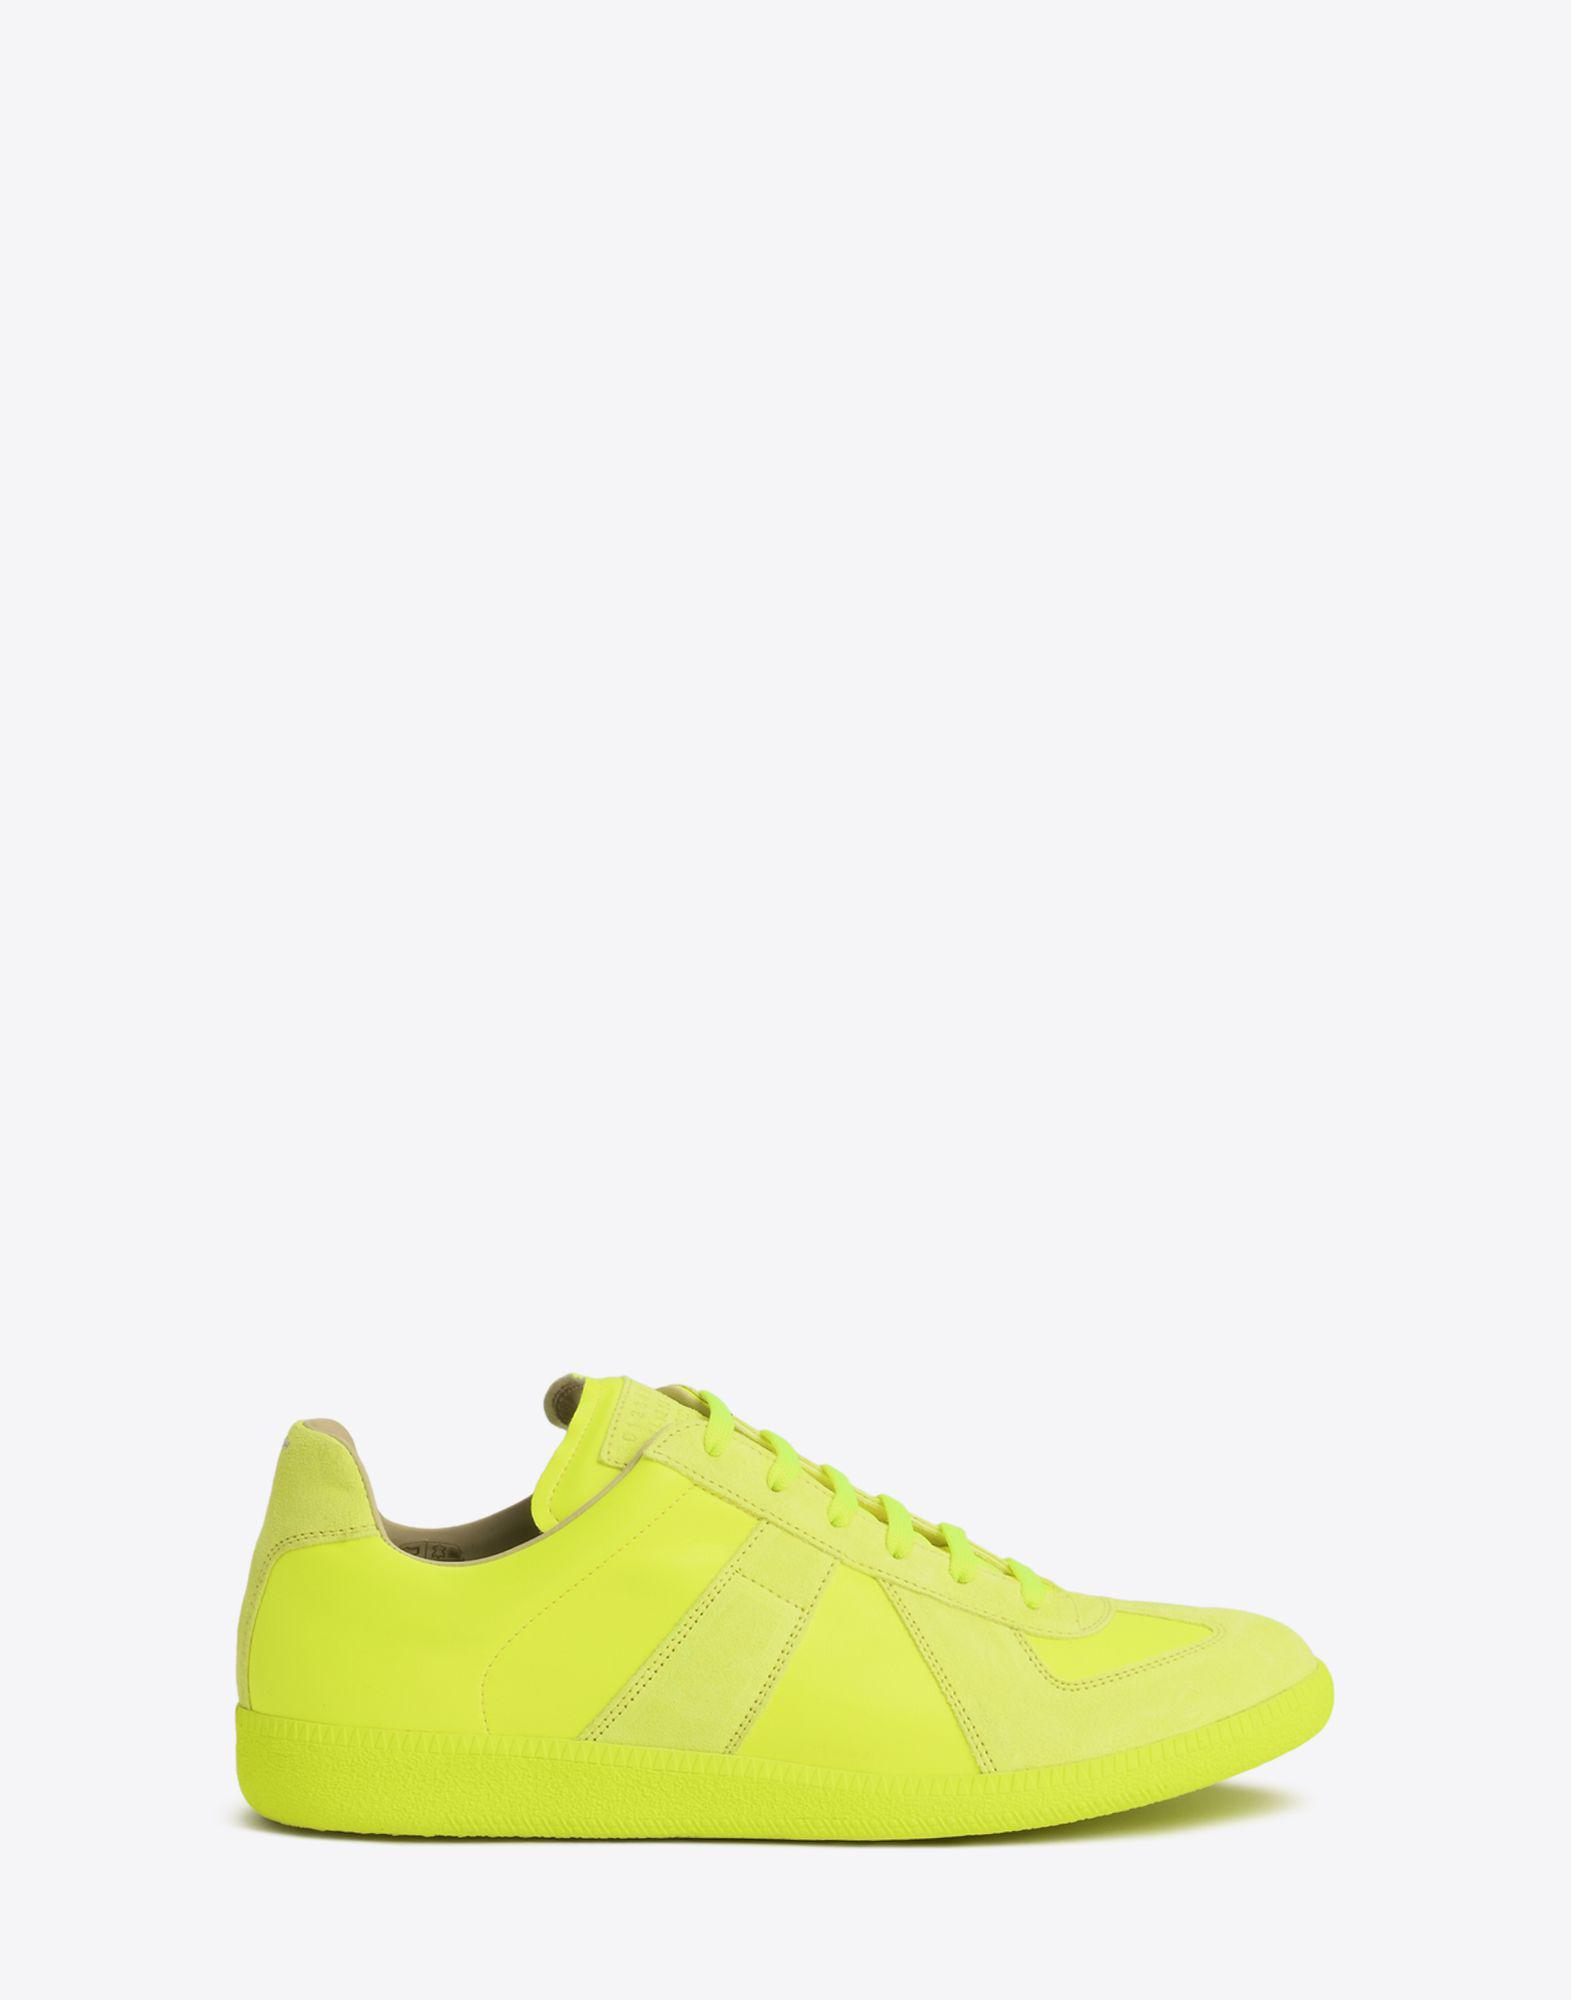 Green Fluo Replica Sneakers Maison Martin Margiela IKCiBK